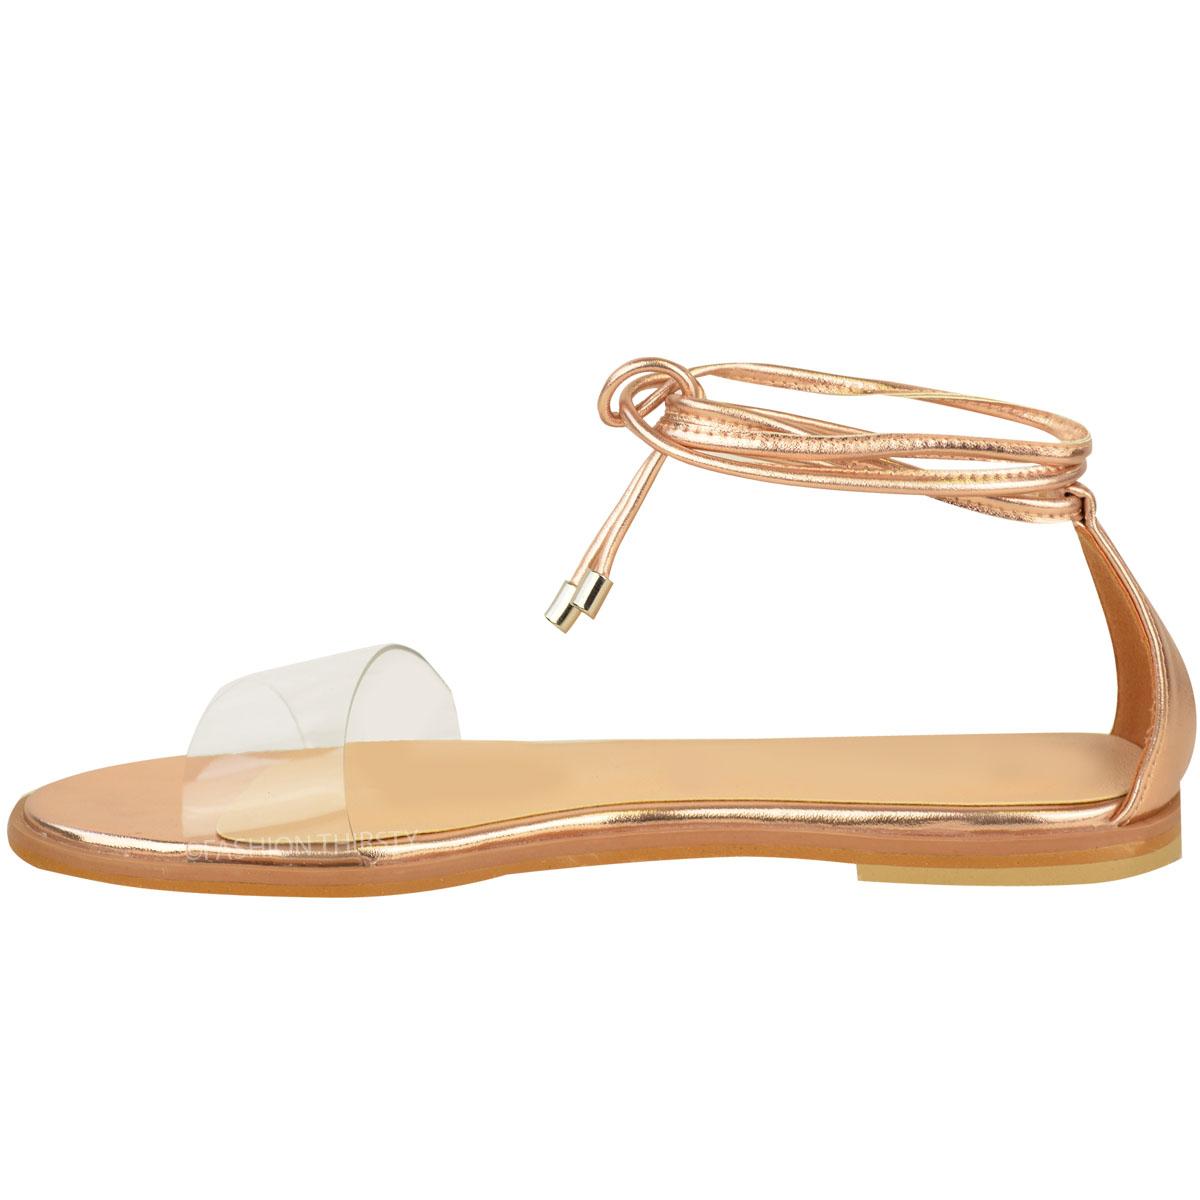 tie up flat sandals photo - 1